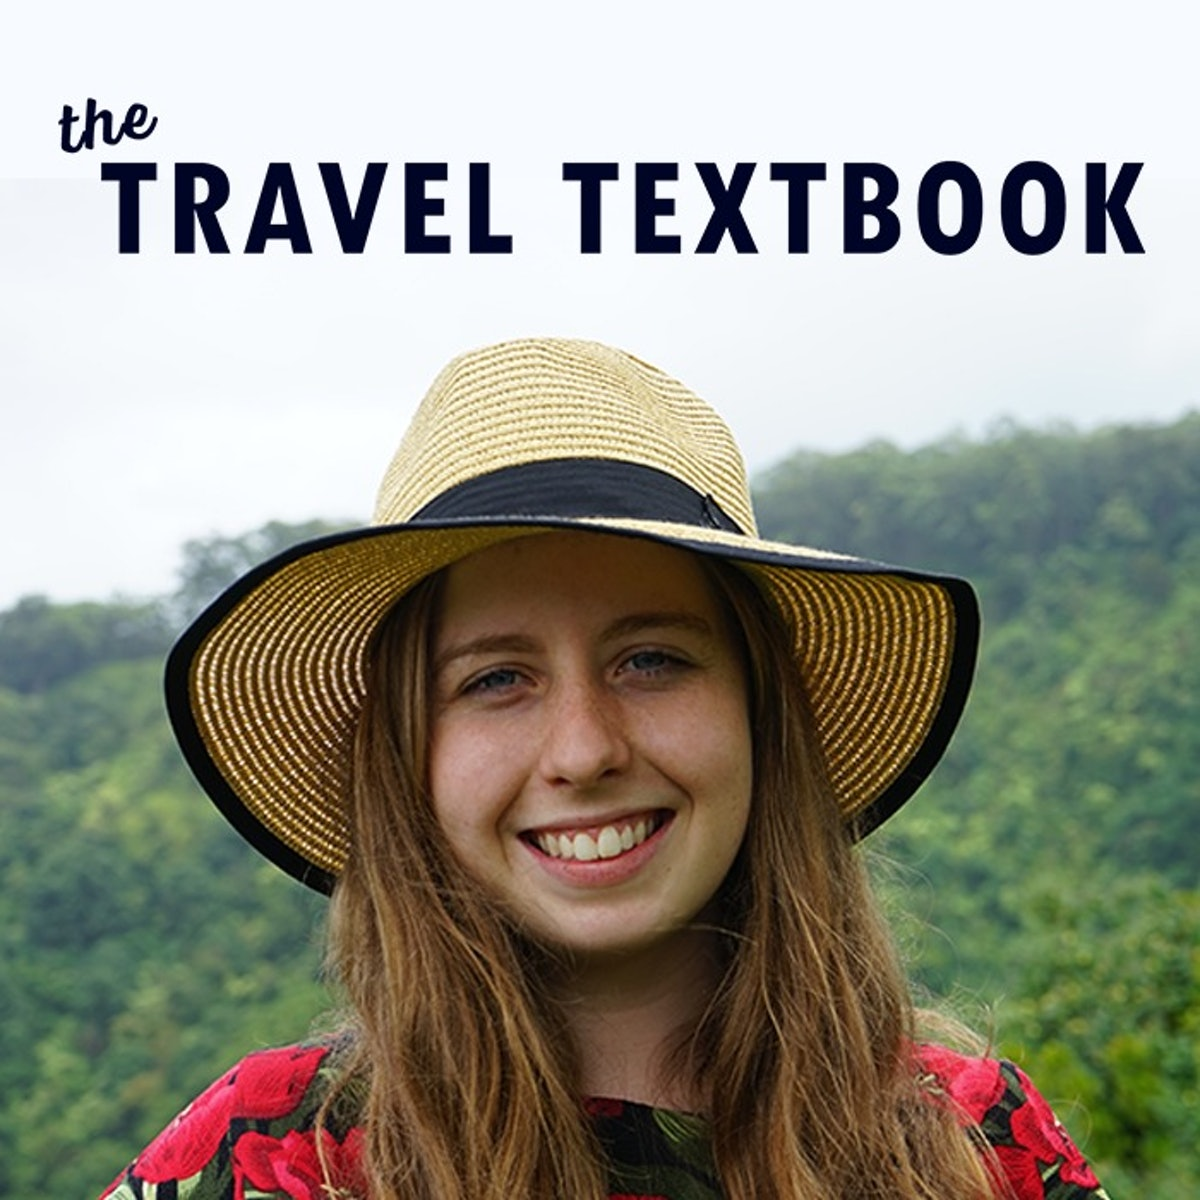 Travel Textbook